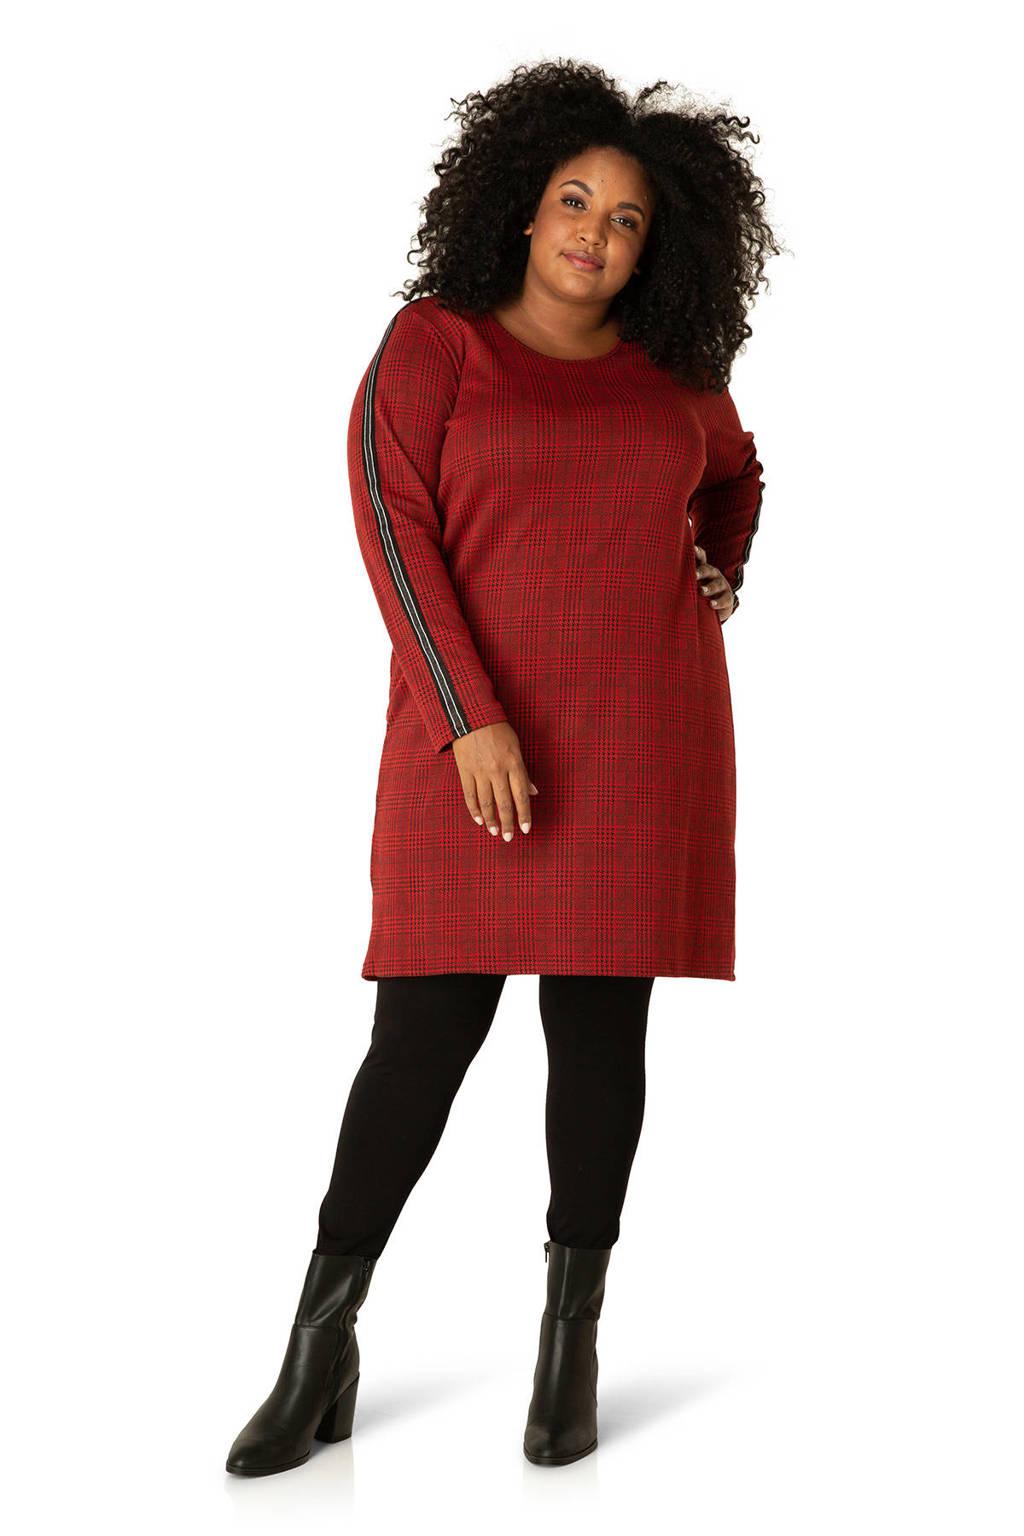 IVY BELLA BY BELLA geruite jurk rood/multi, Rood/multi